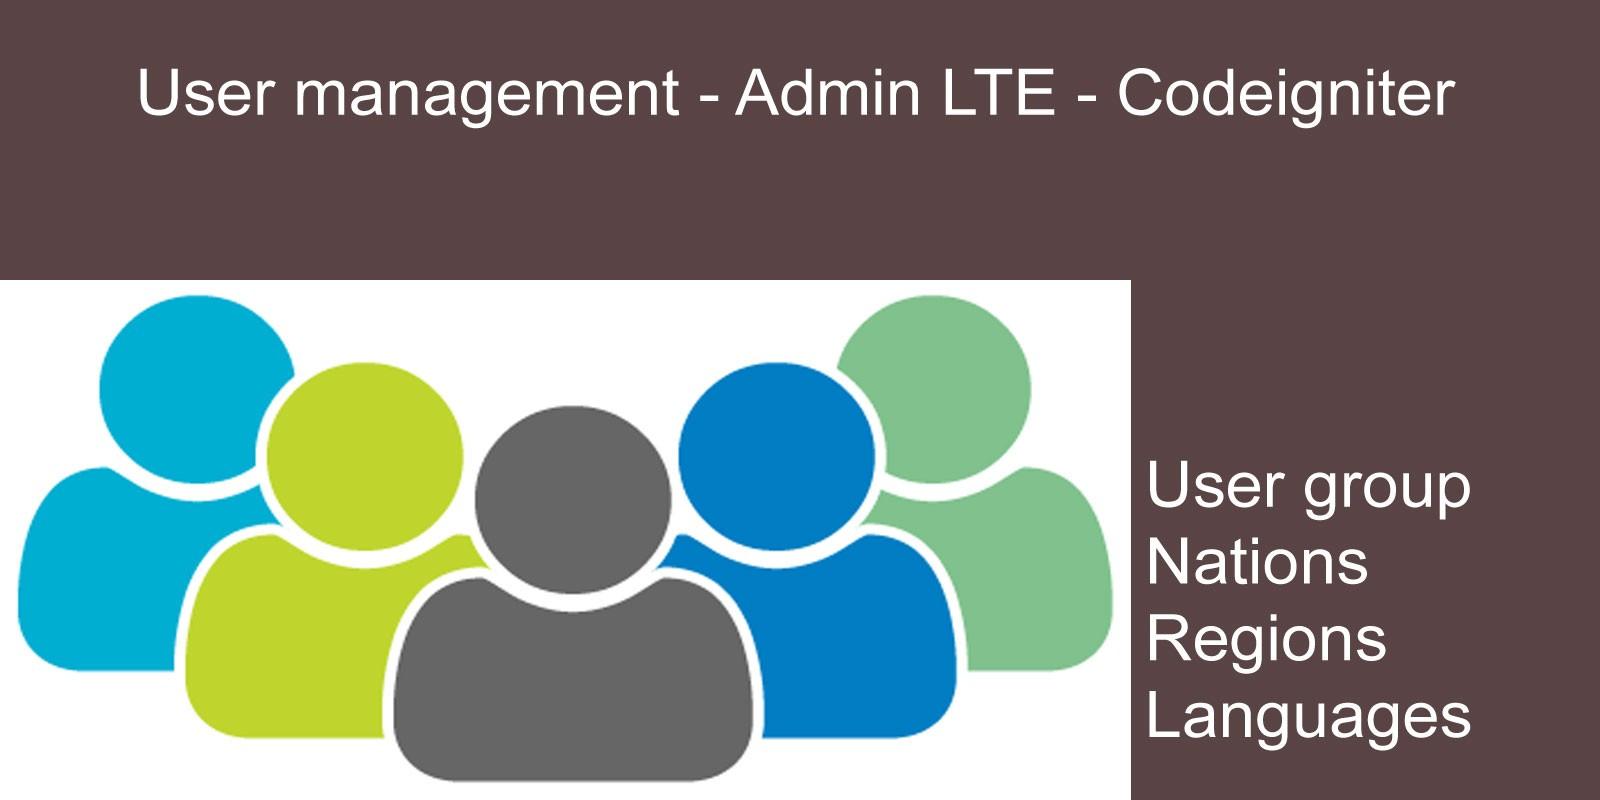 User management - Codeigniter Admin LTE